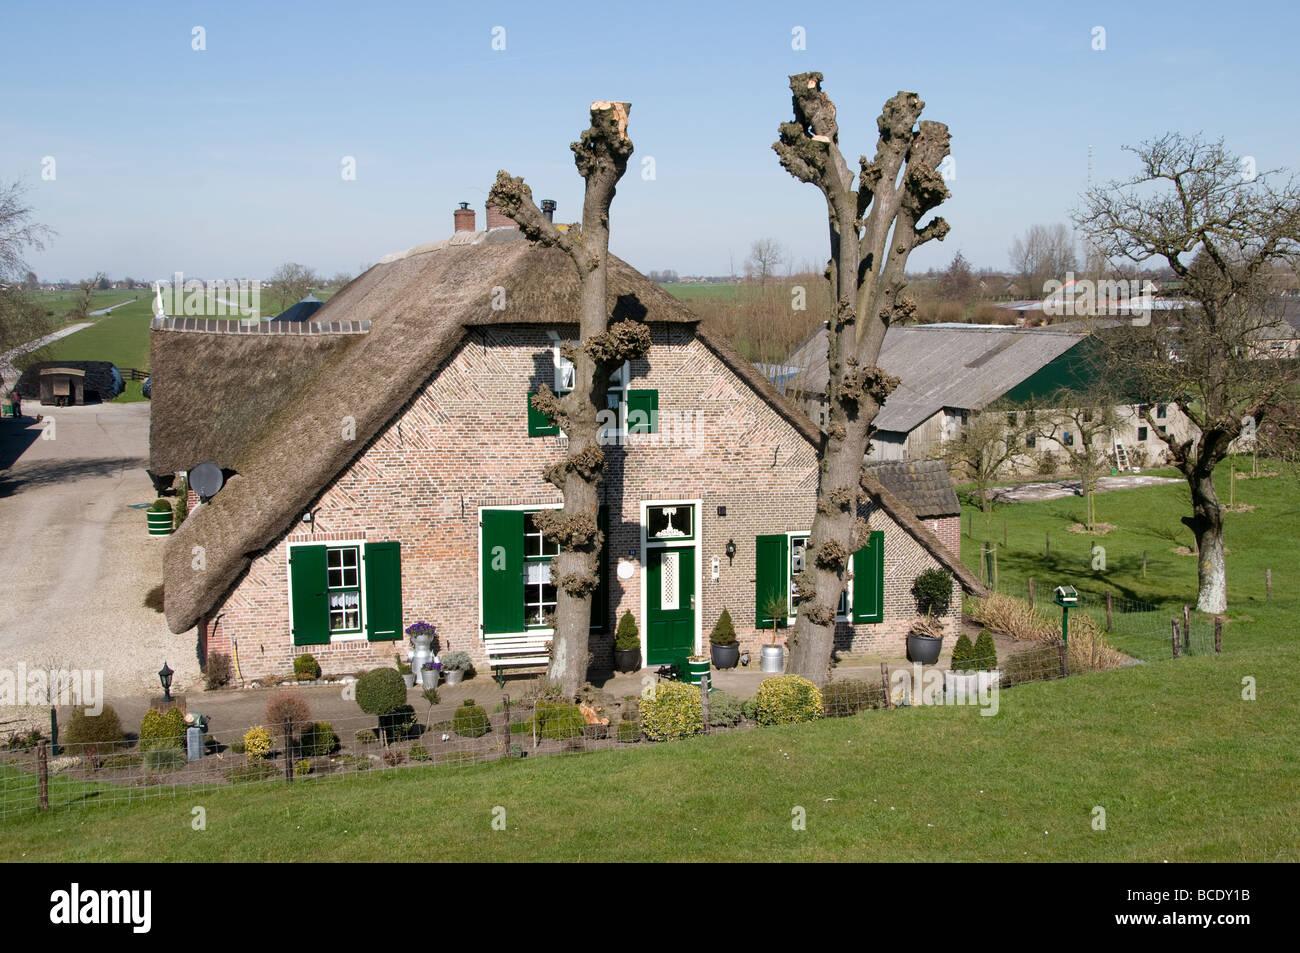 Schoonhoven Lek Silver town Netherlands Holland - Stock Image